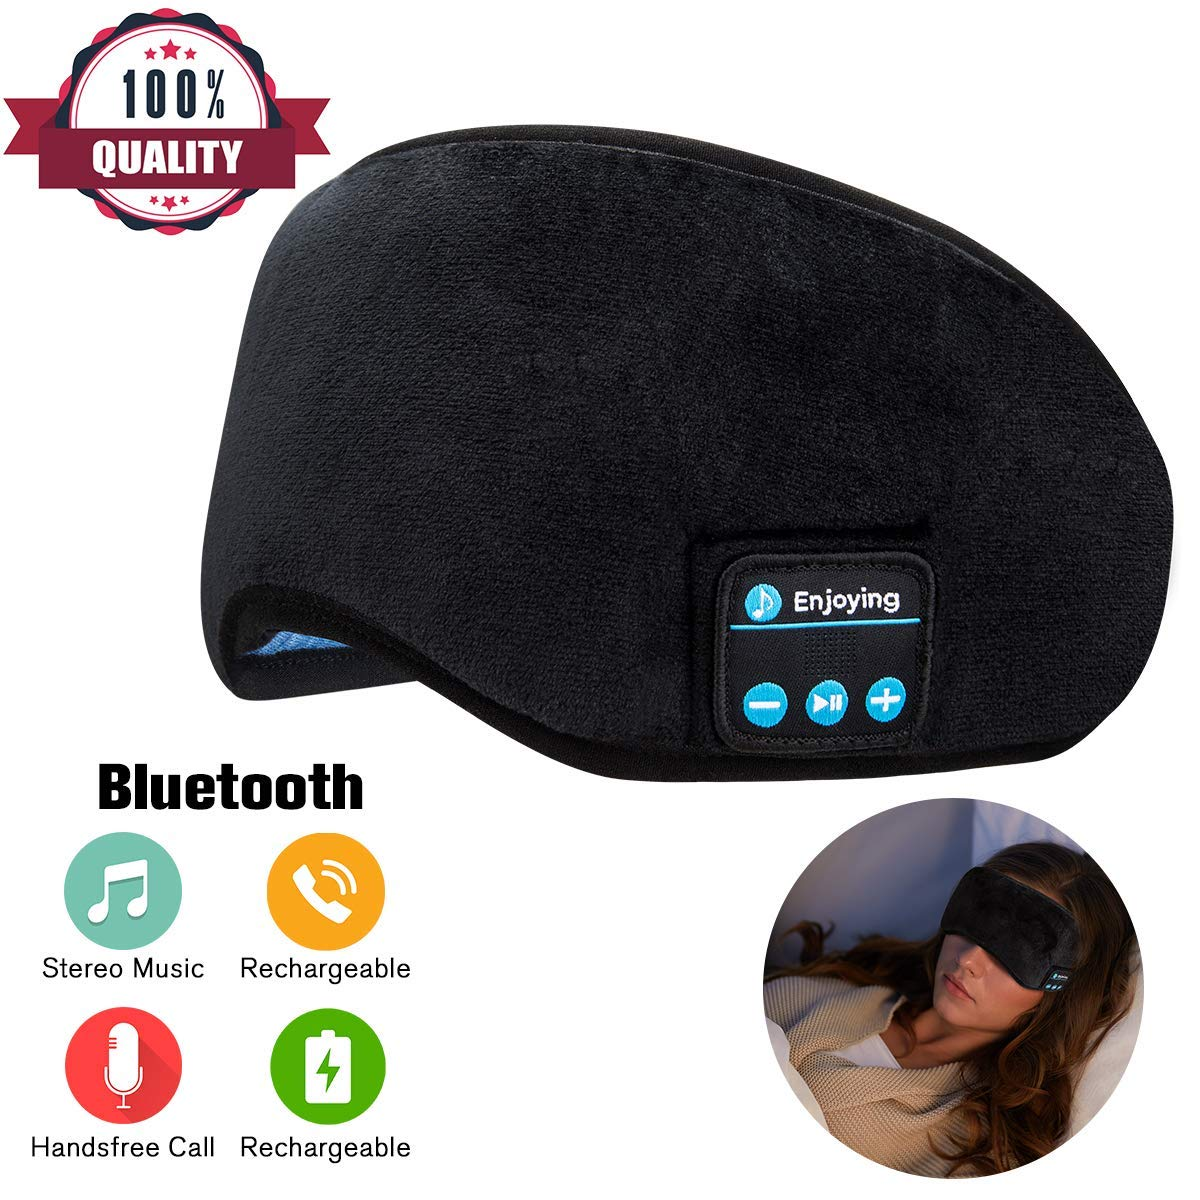 Sleep Headphones,Wireless Sleeping Headphones Bluetooth Sleep Headphones Stereo Sleep Mask Headphones Bluetooth Sleep Eye Mask Headphones for Sleeping Music Travel Headphones Headset with Microphone